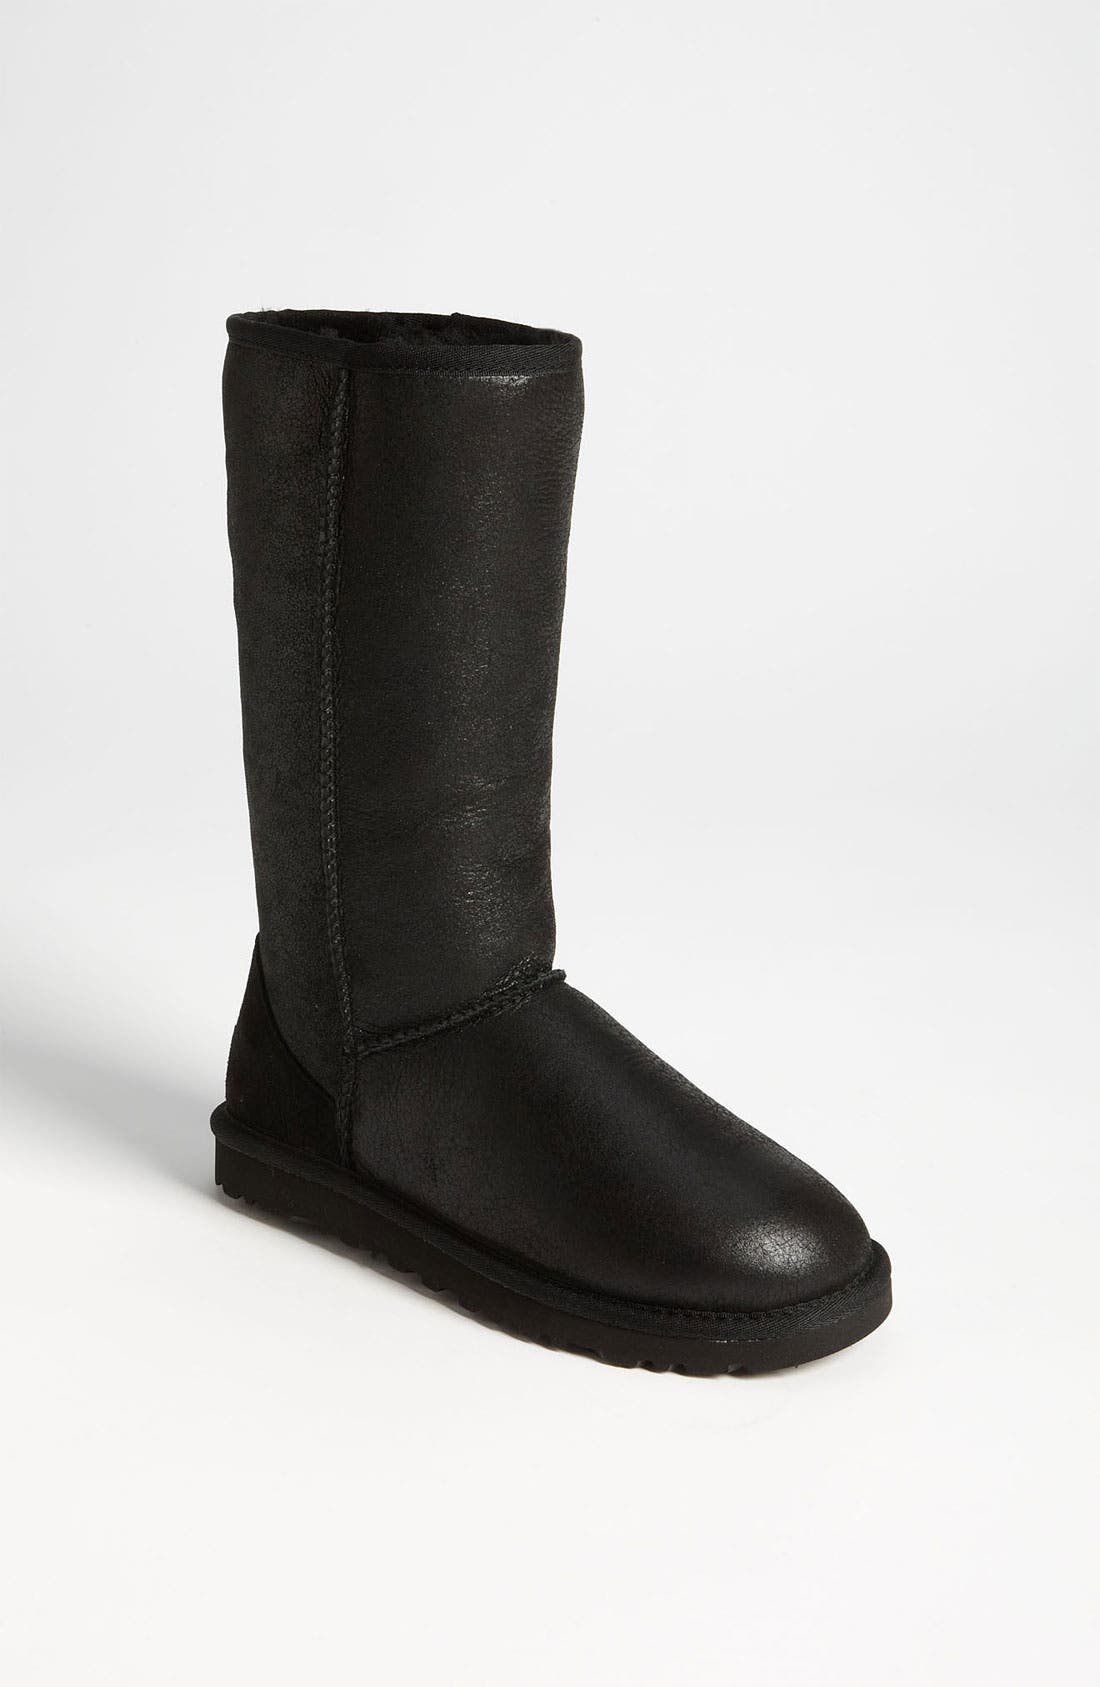 Alternate Image 1 Selected - UGG® Australia 'Classic Tall Bomber' Boot (Women)